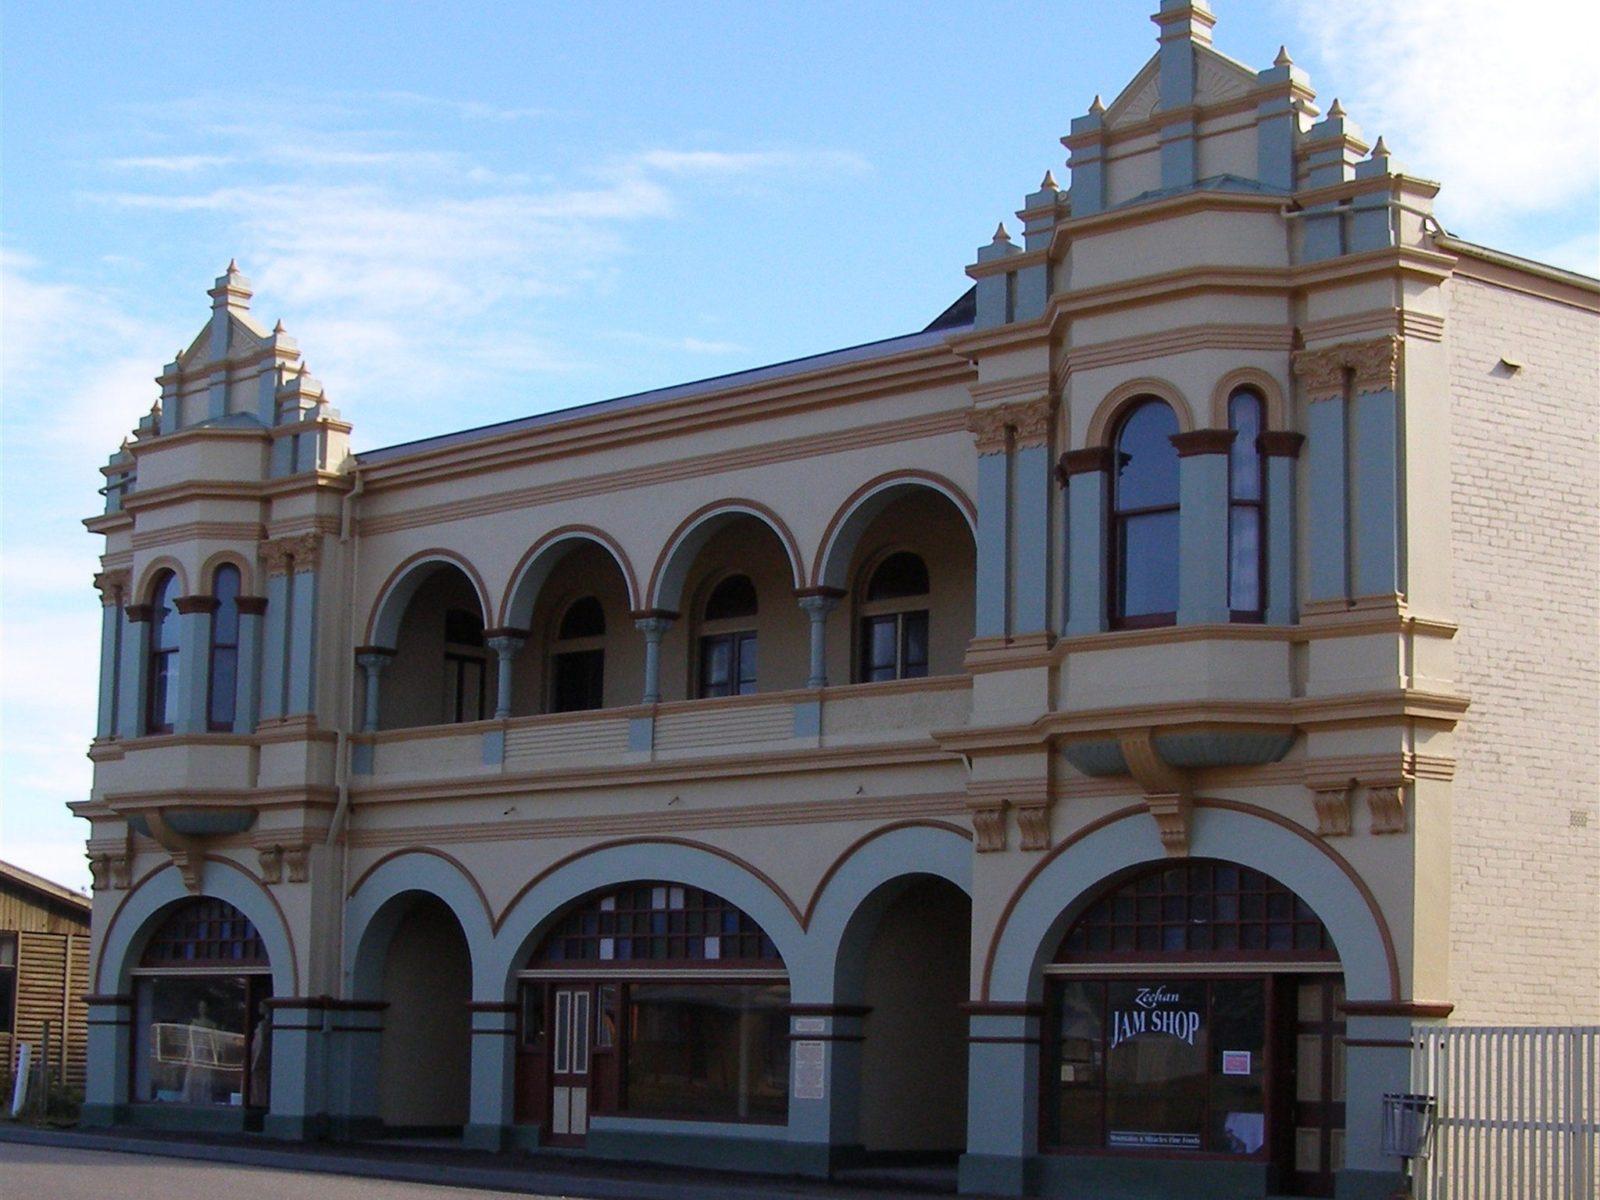 Gaiety Theatre - exterior